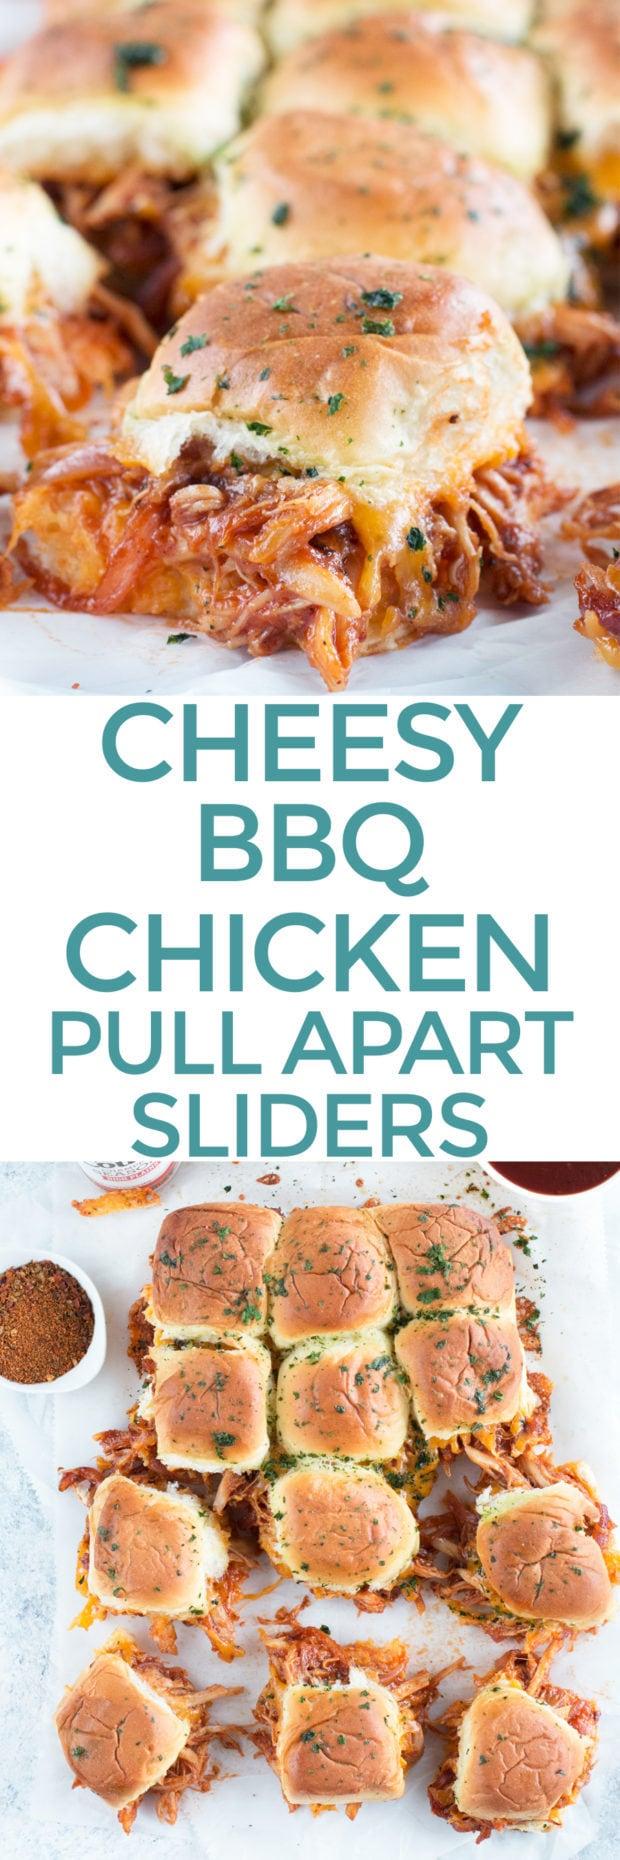 Cheesy BBQ Chicken Pull Apart Sliders